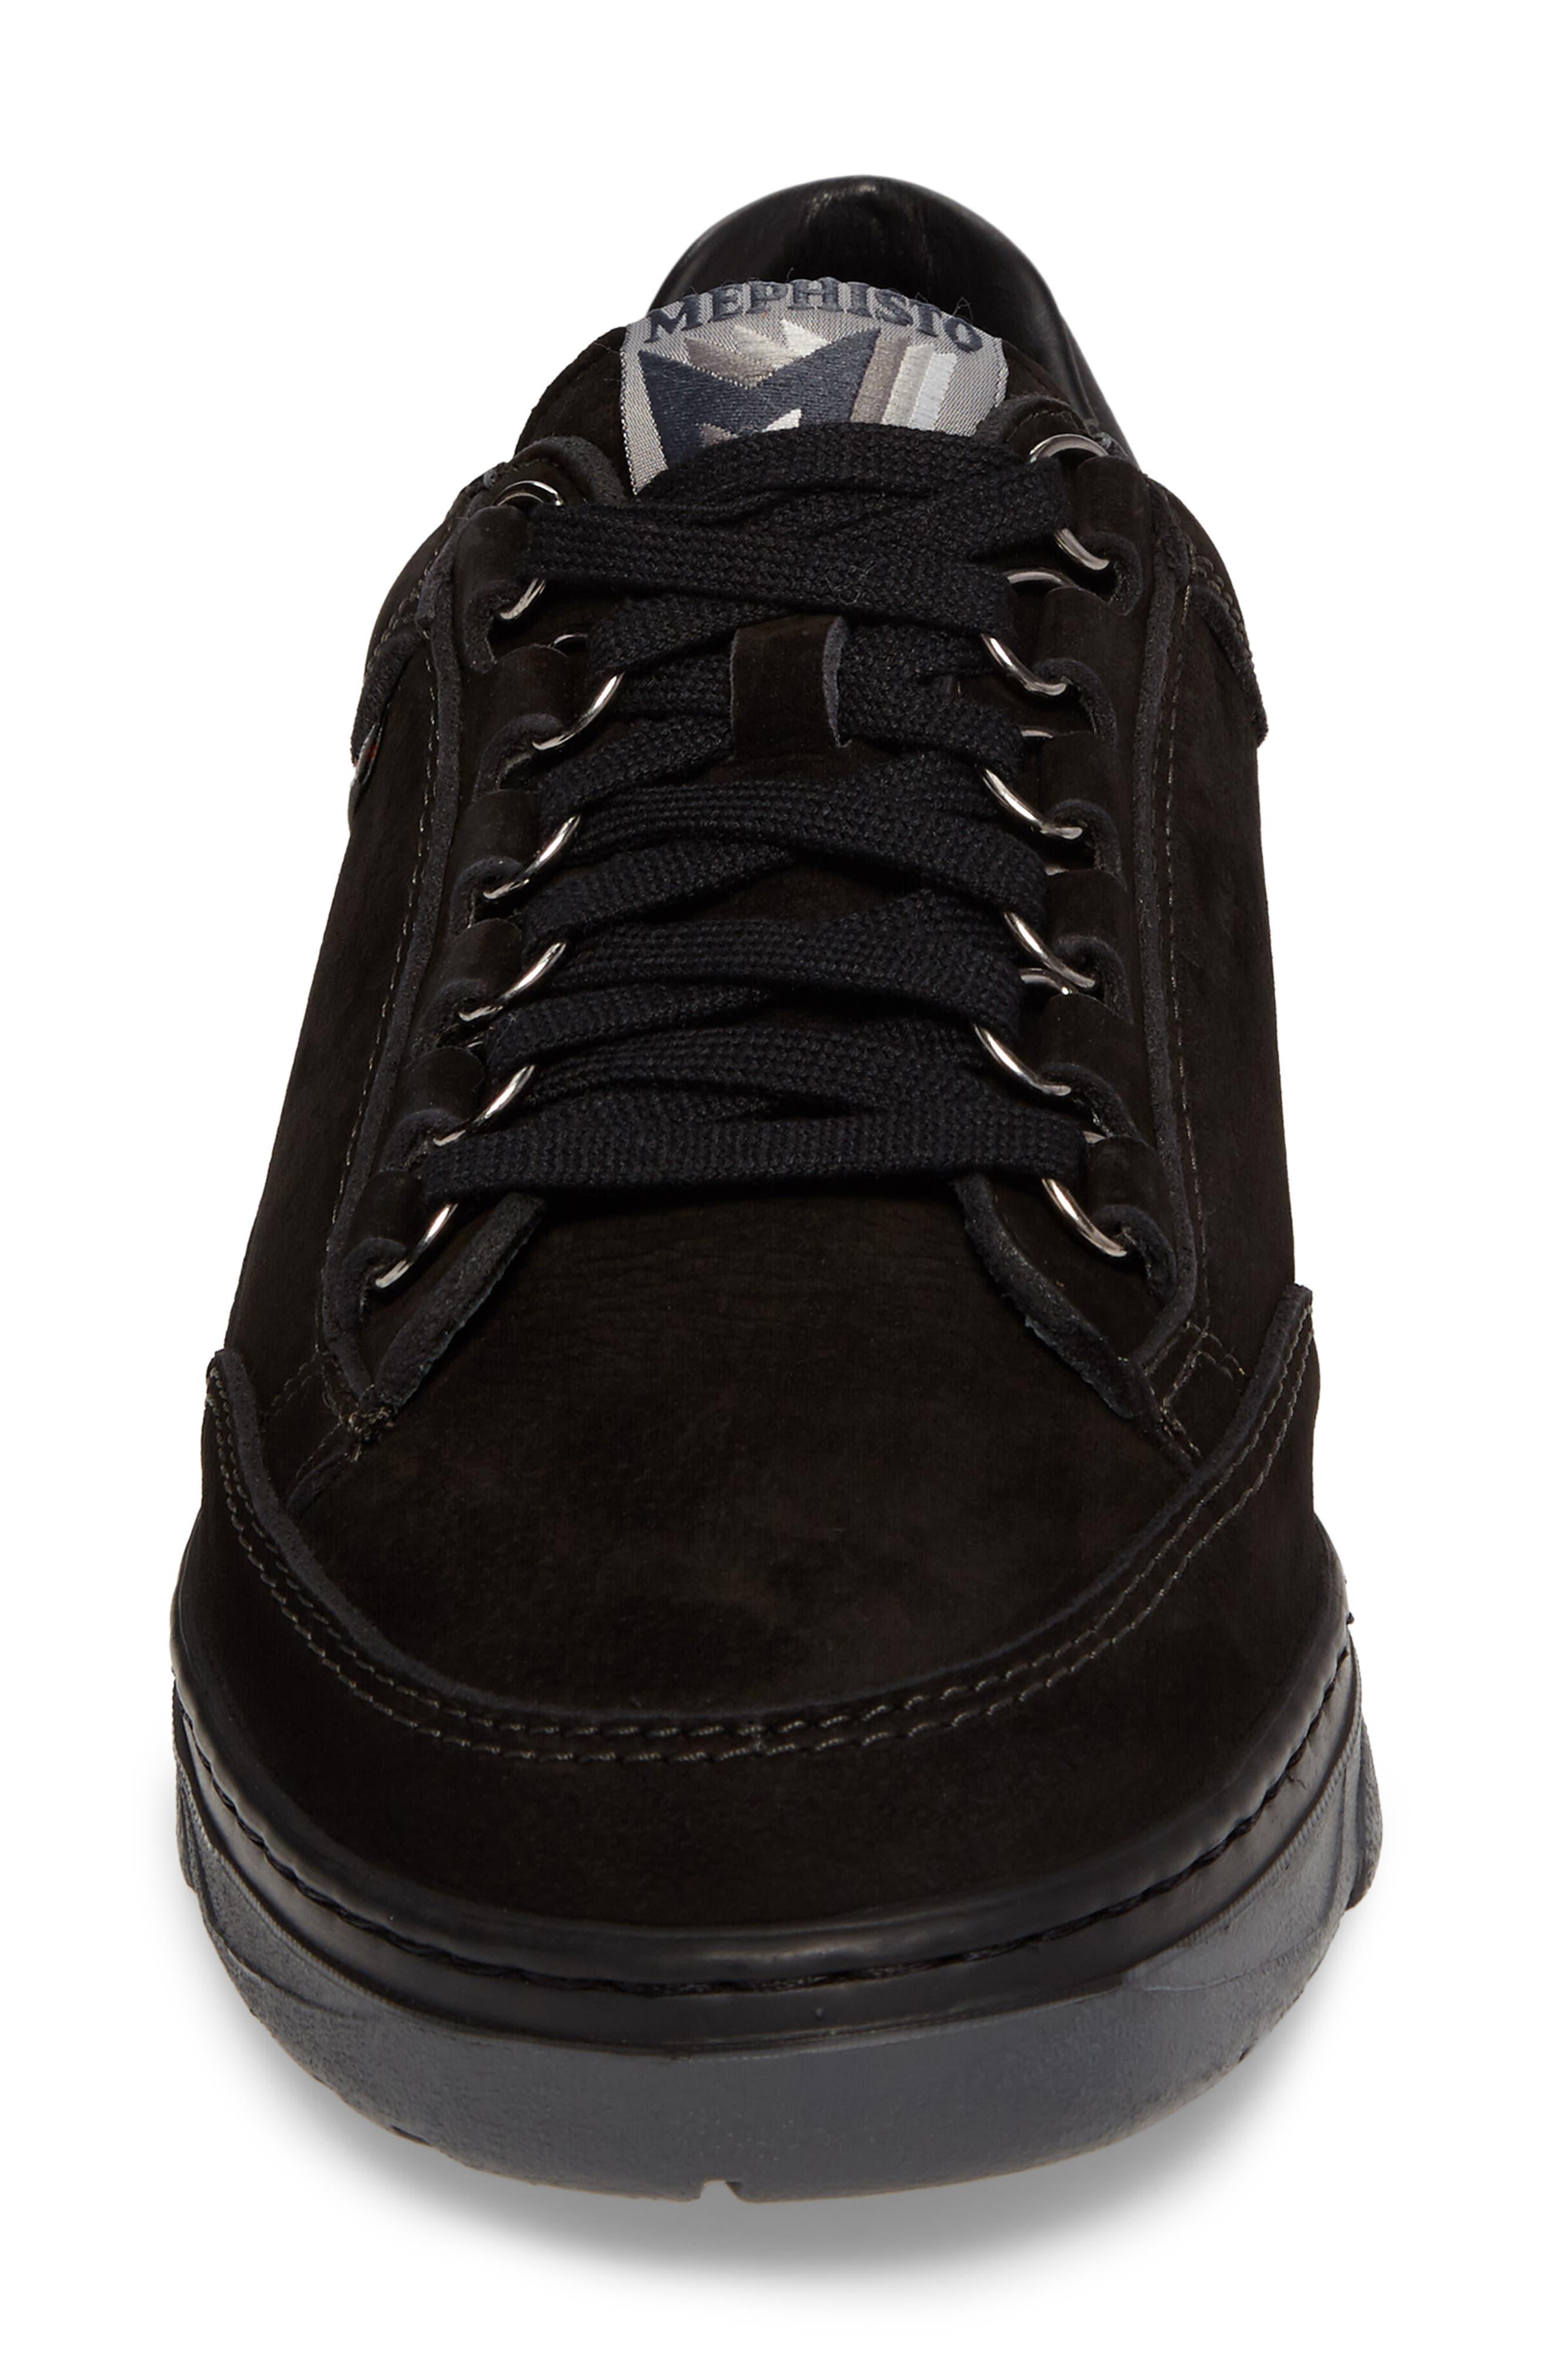 Mick Sneaker,                             Alternate thumbnail 4, color,                             BLACK SPORTBUCK